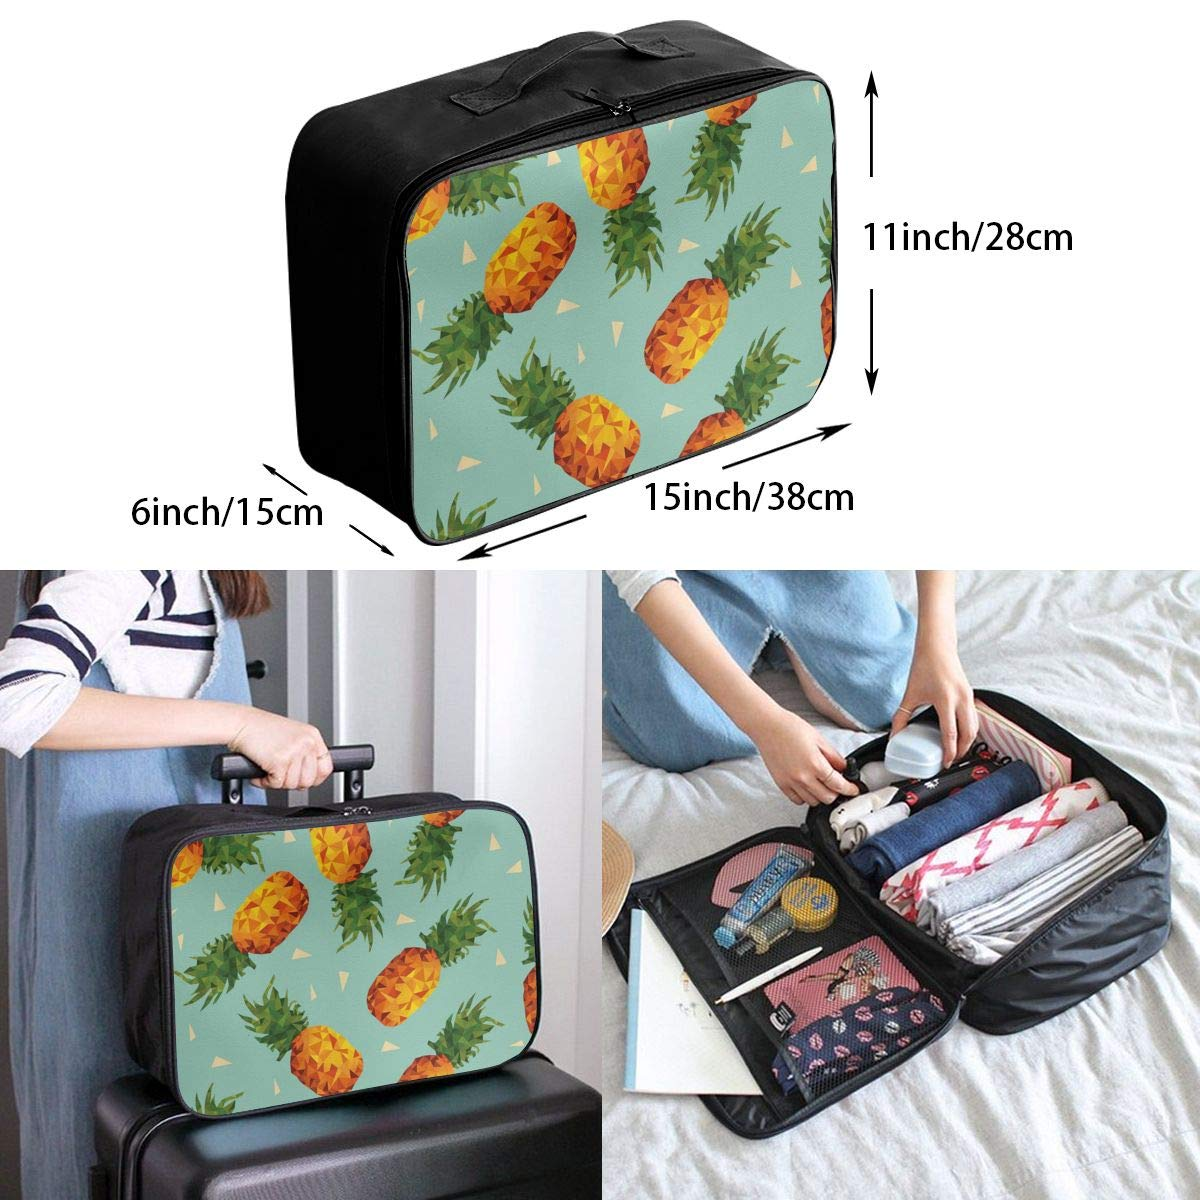 Vintage Pineapples Summer Beach Hawaii Travel Lightweight Waterproof Folding Storage Carry Luggage Duffle Tote Bag Large Capacity In Trolley Handle Bags 6x11x15 Inch